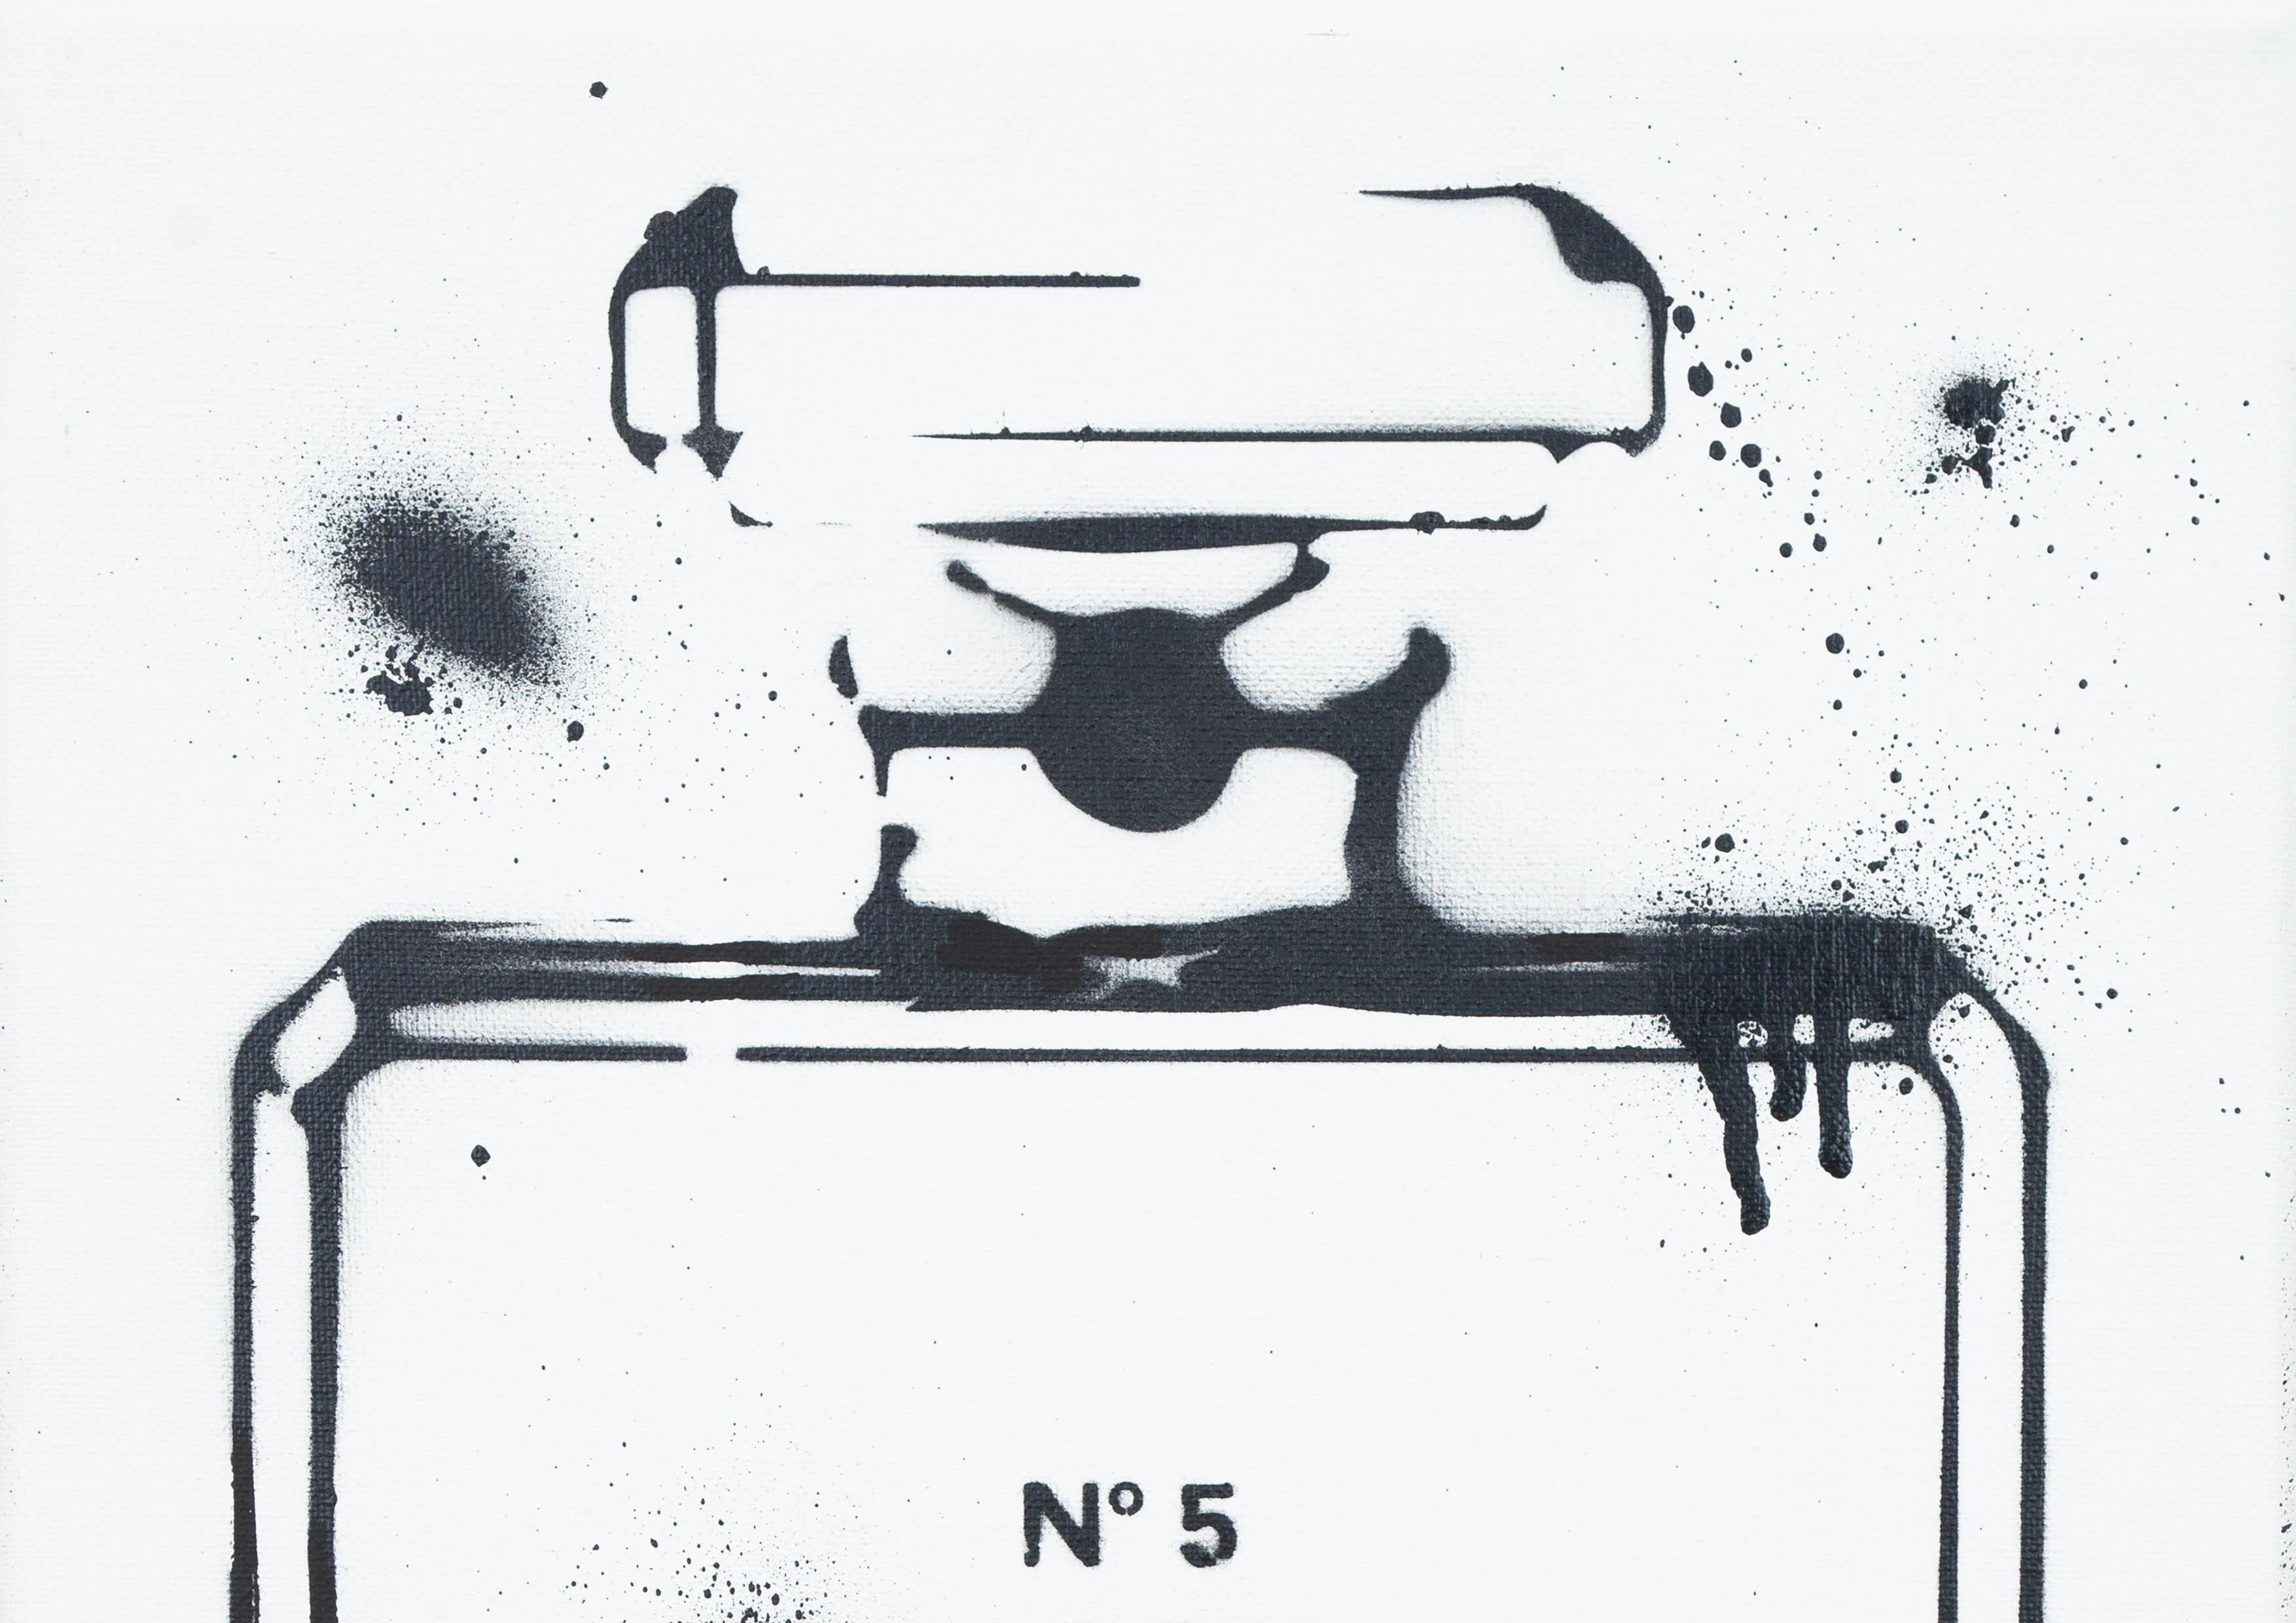 ART-PAINT-CHANEL-PERFUME-JUST-BLACK-CANVAS-DETAIL-2